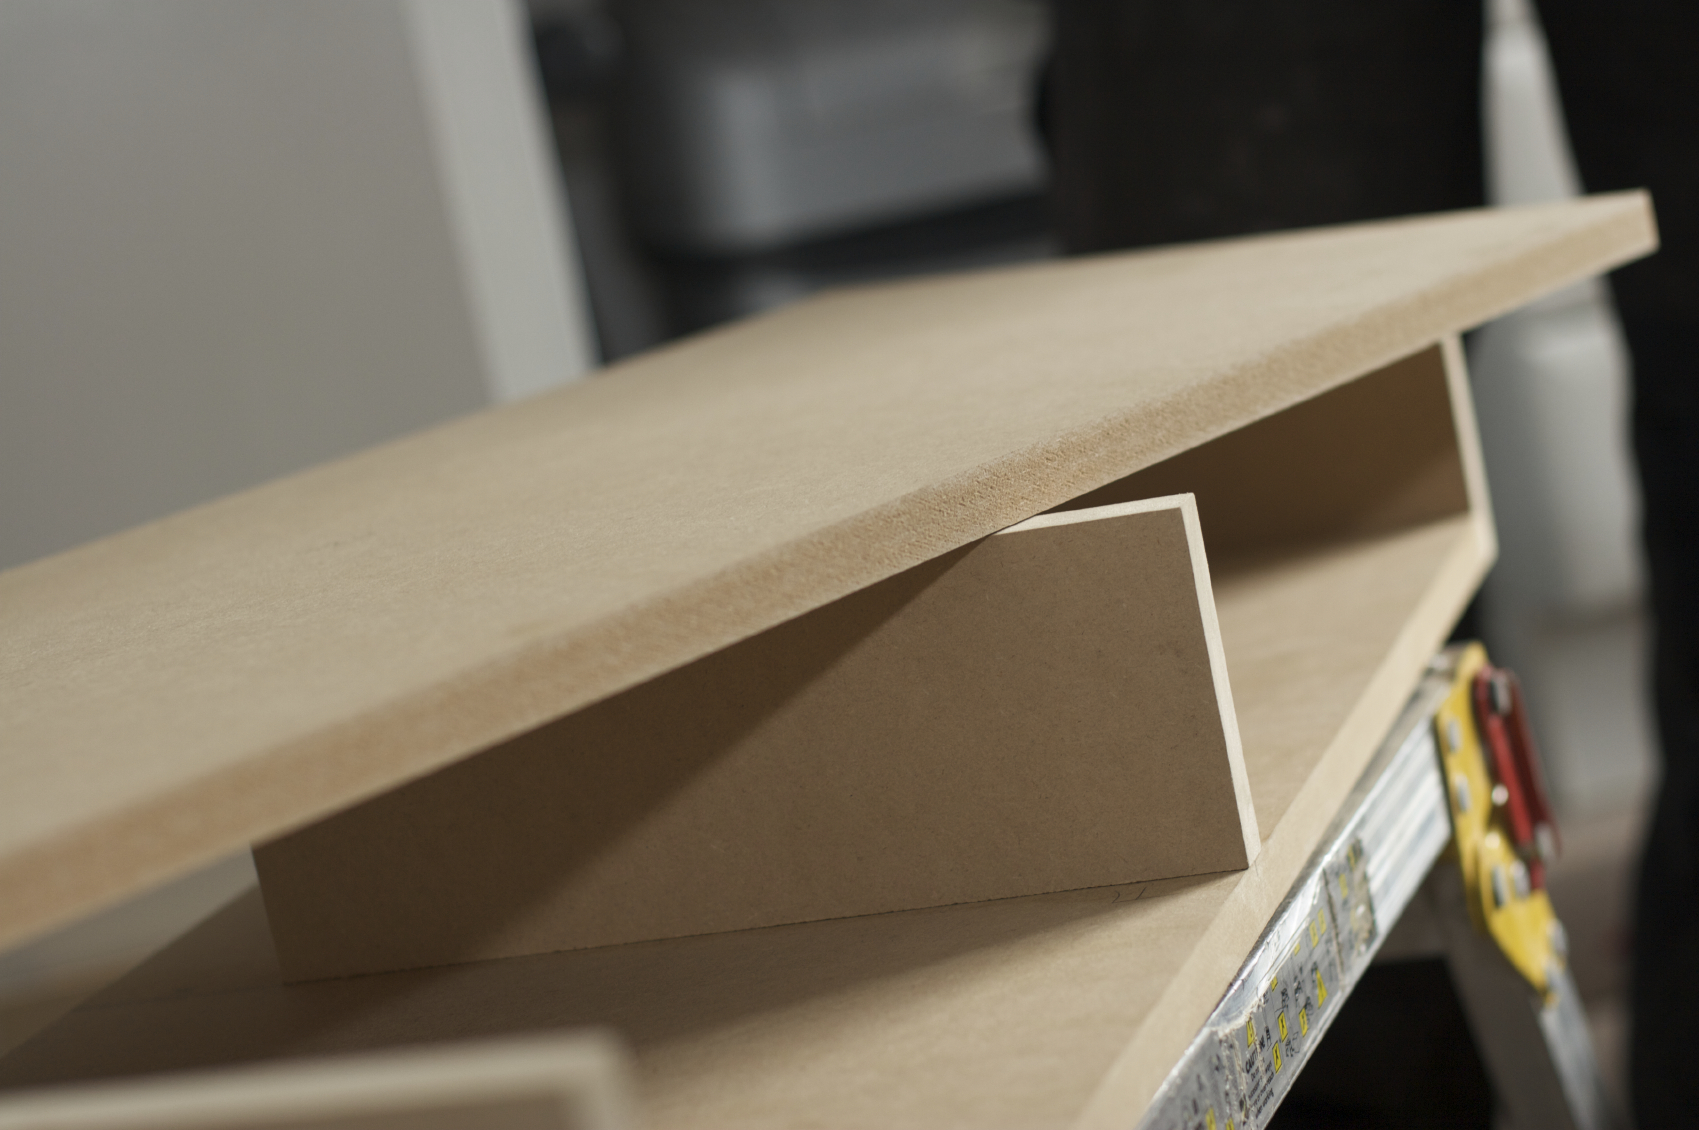 Medium density fiberboard mdf columbia forest products